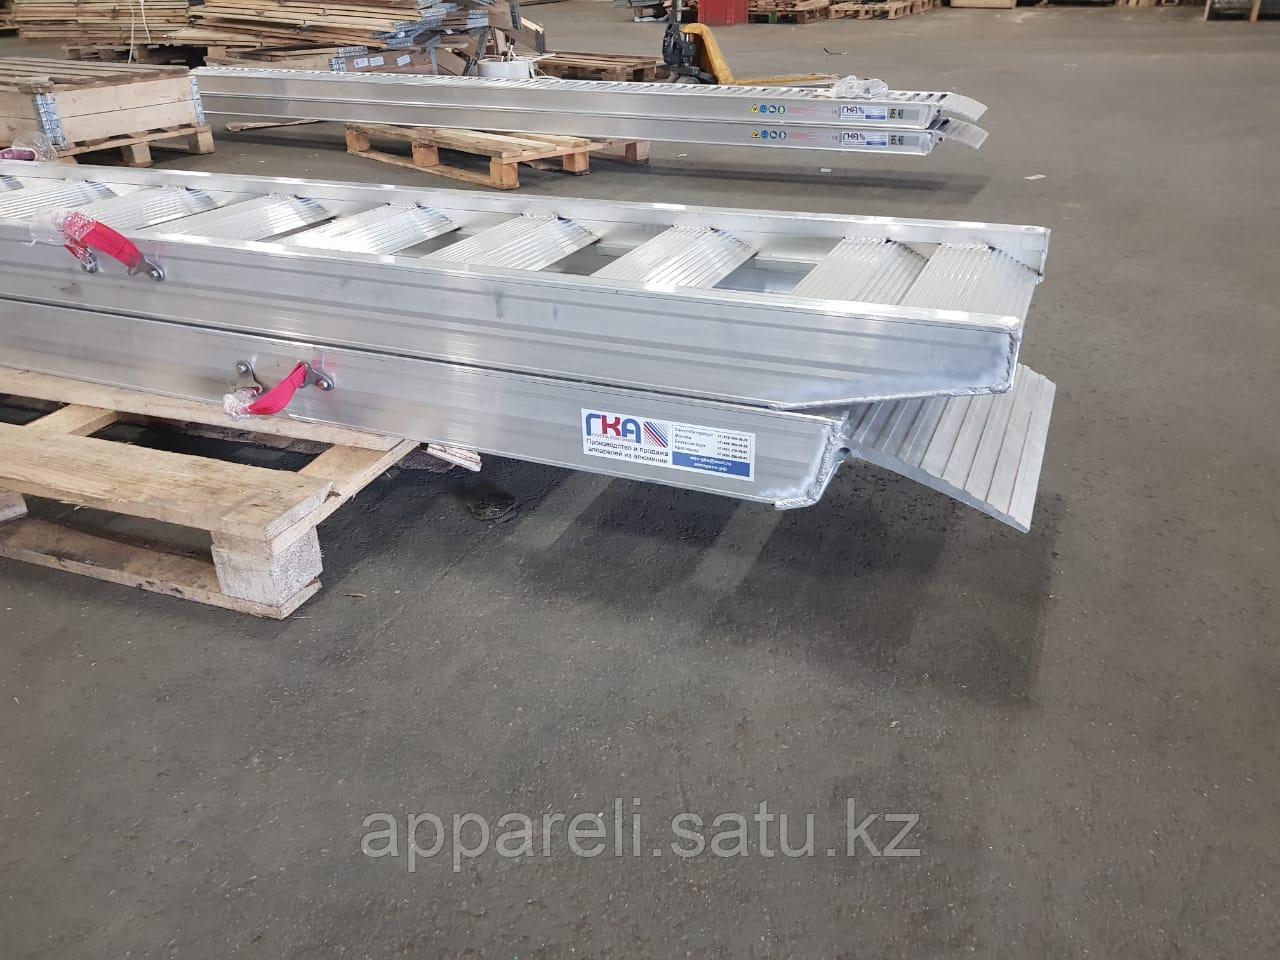 Алюминиевые аппарели от производителя 2,5 метра, 7,5 тонн